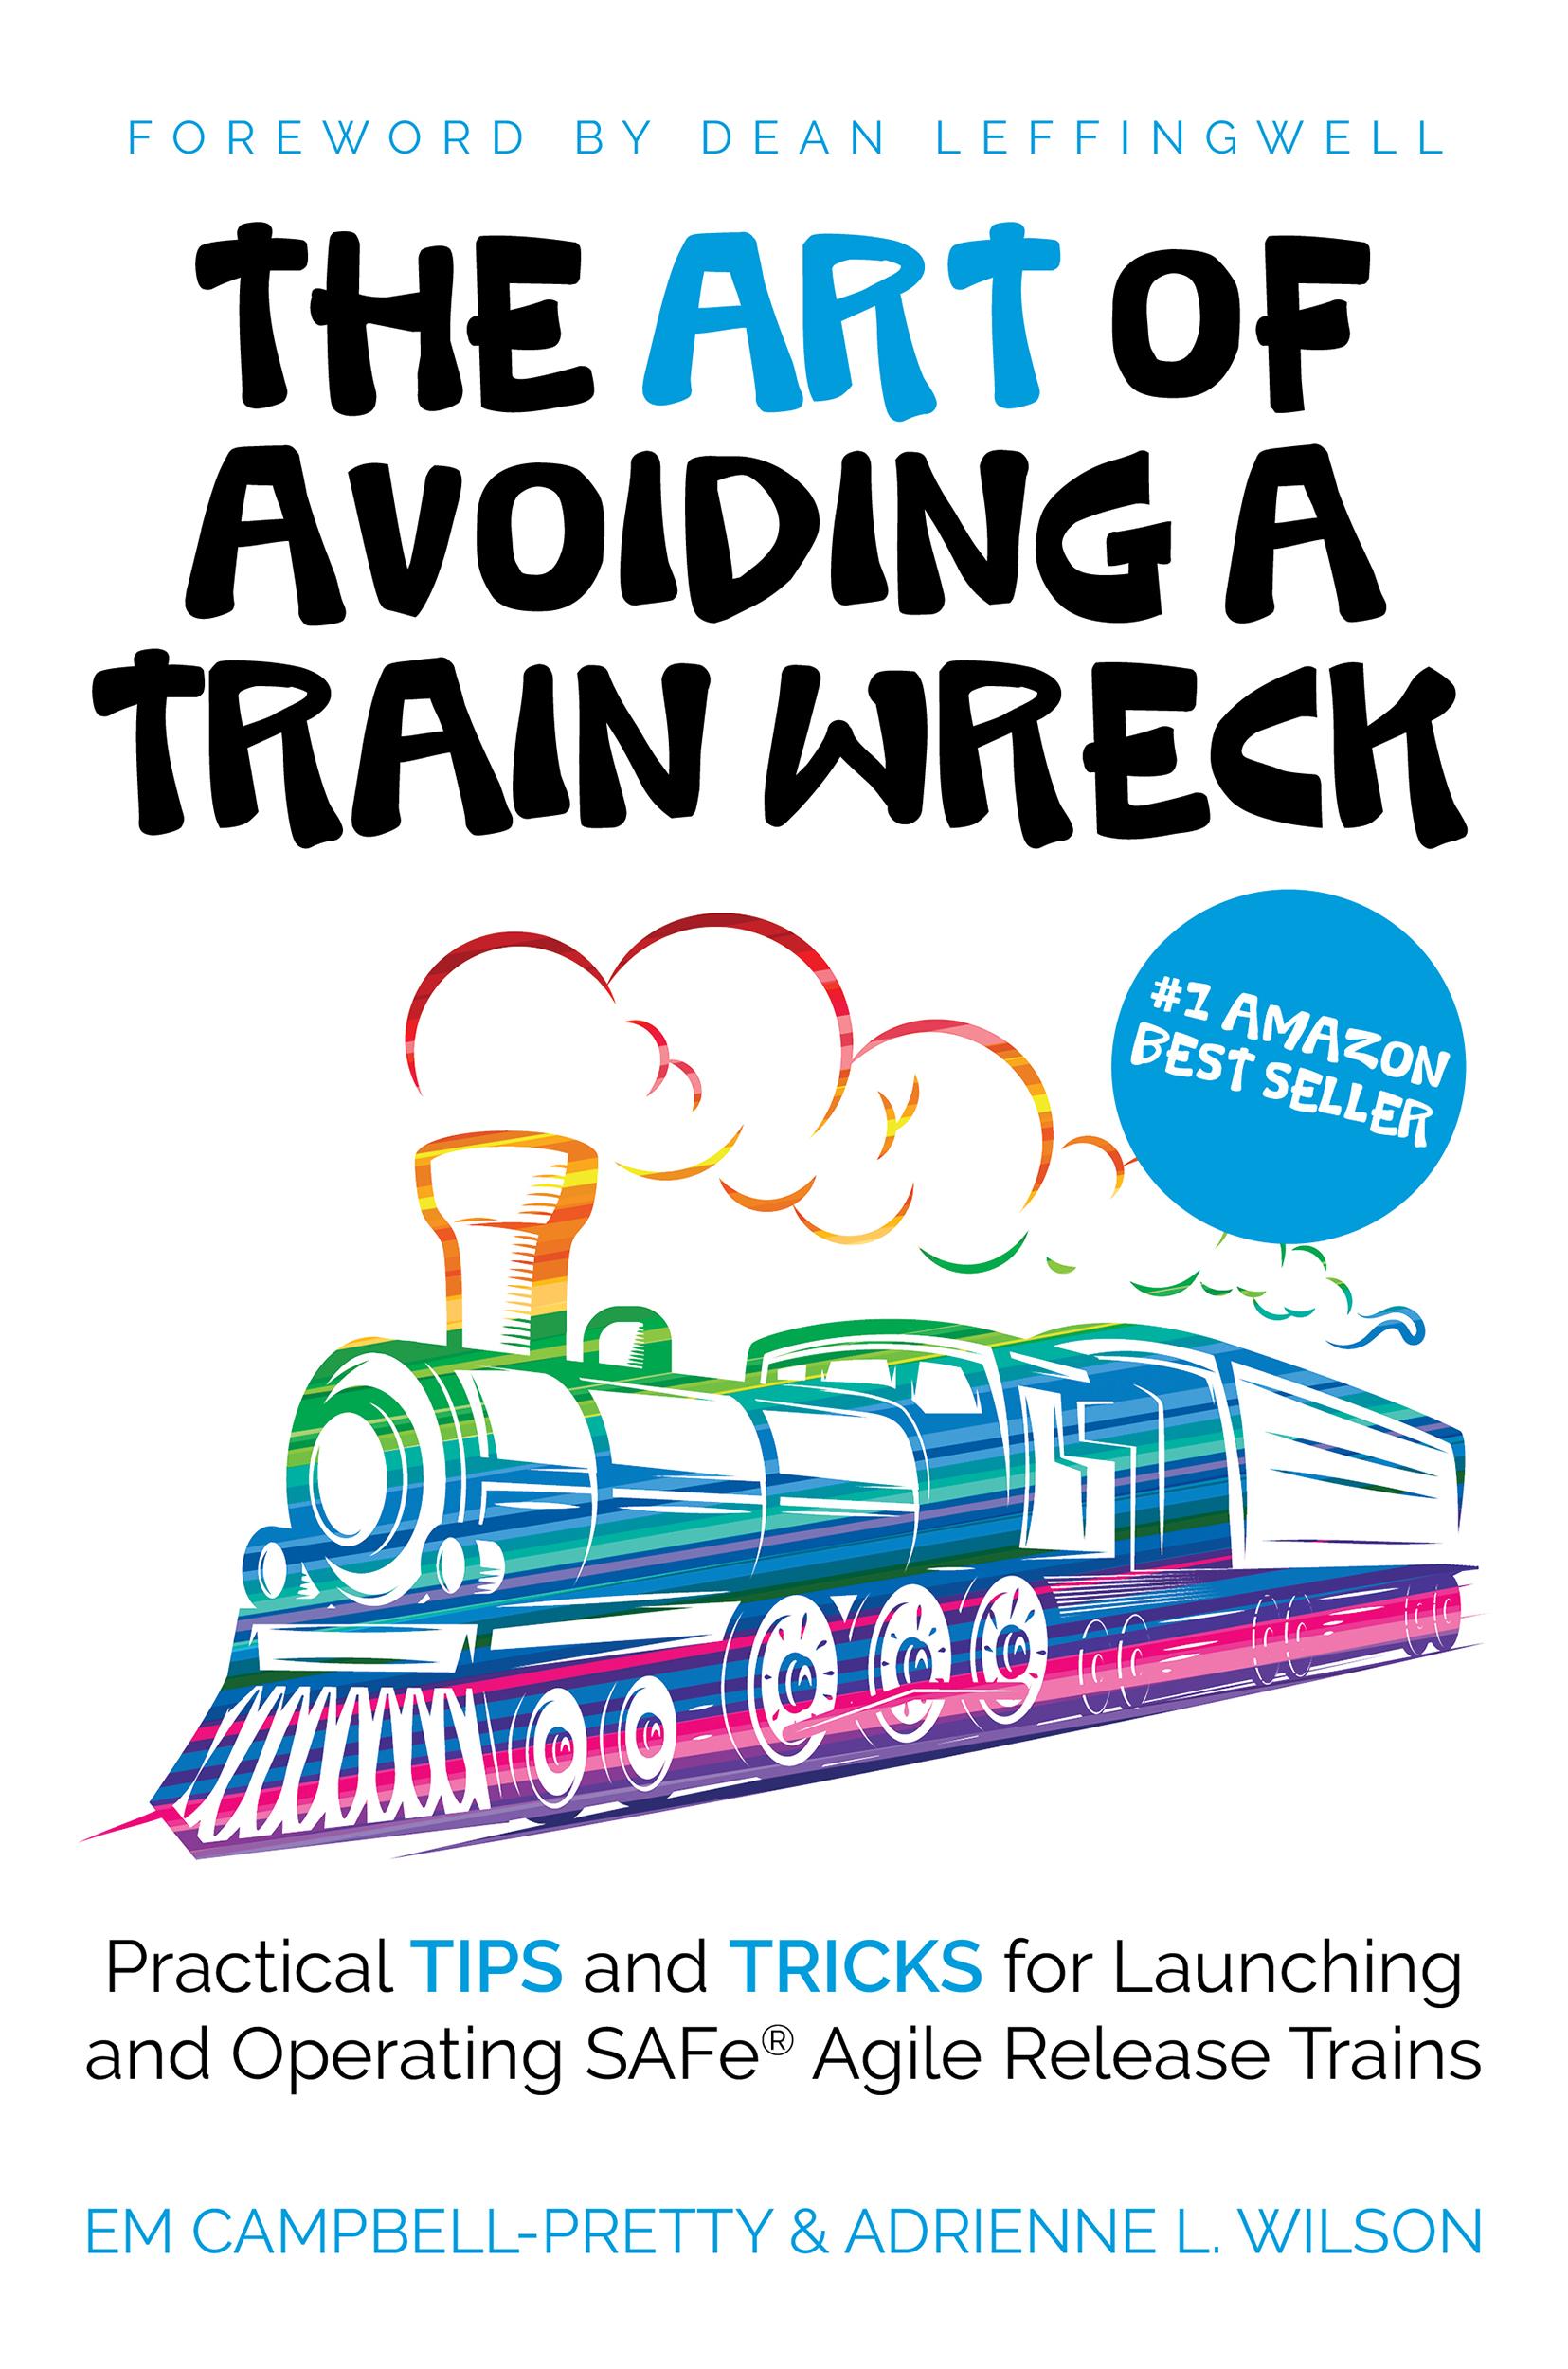 The ART of Avoiding a Train Wreck